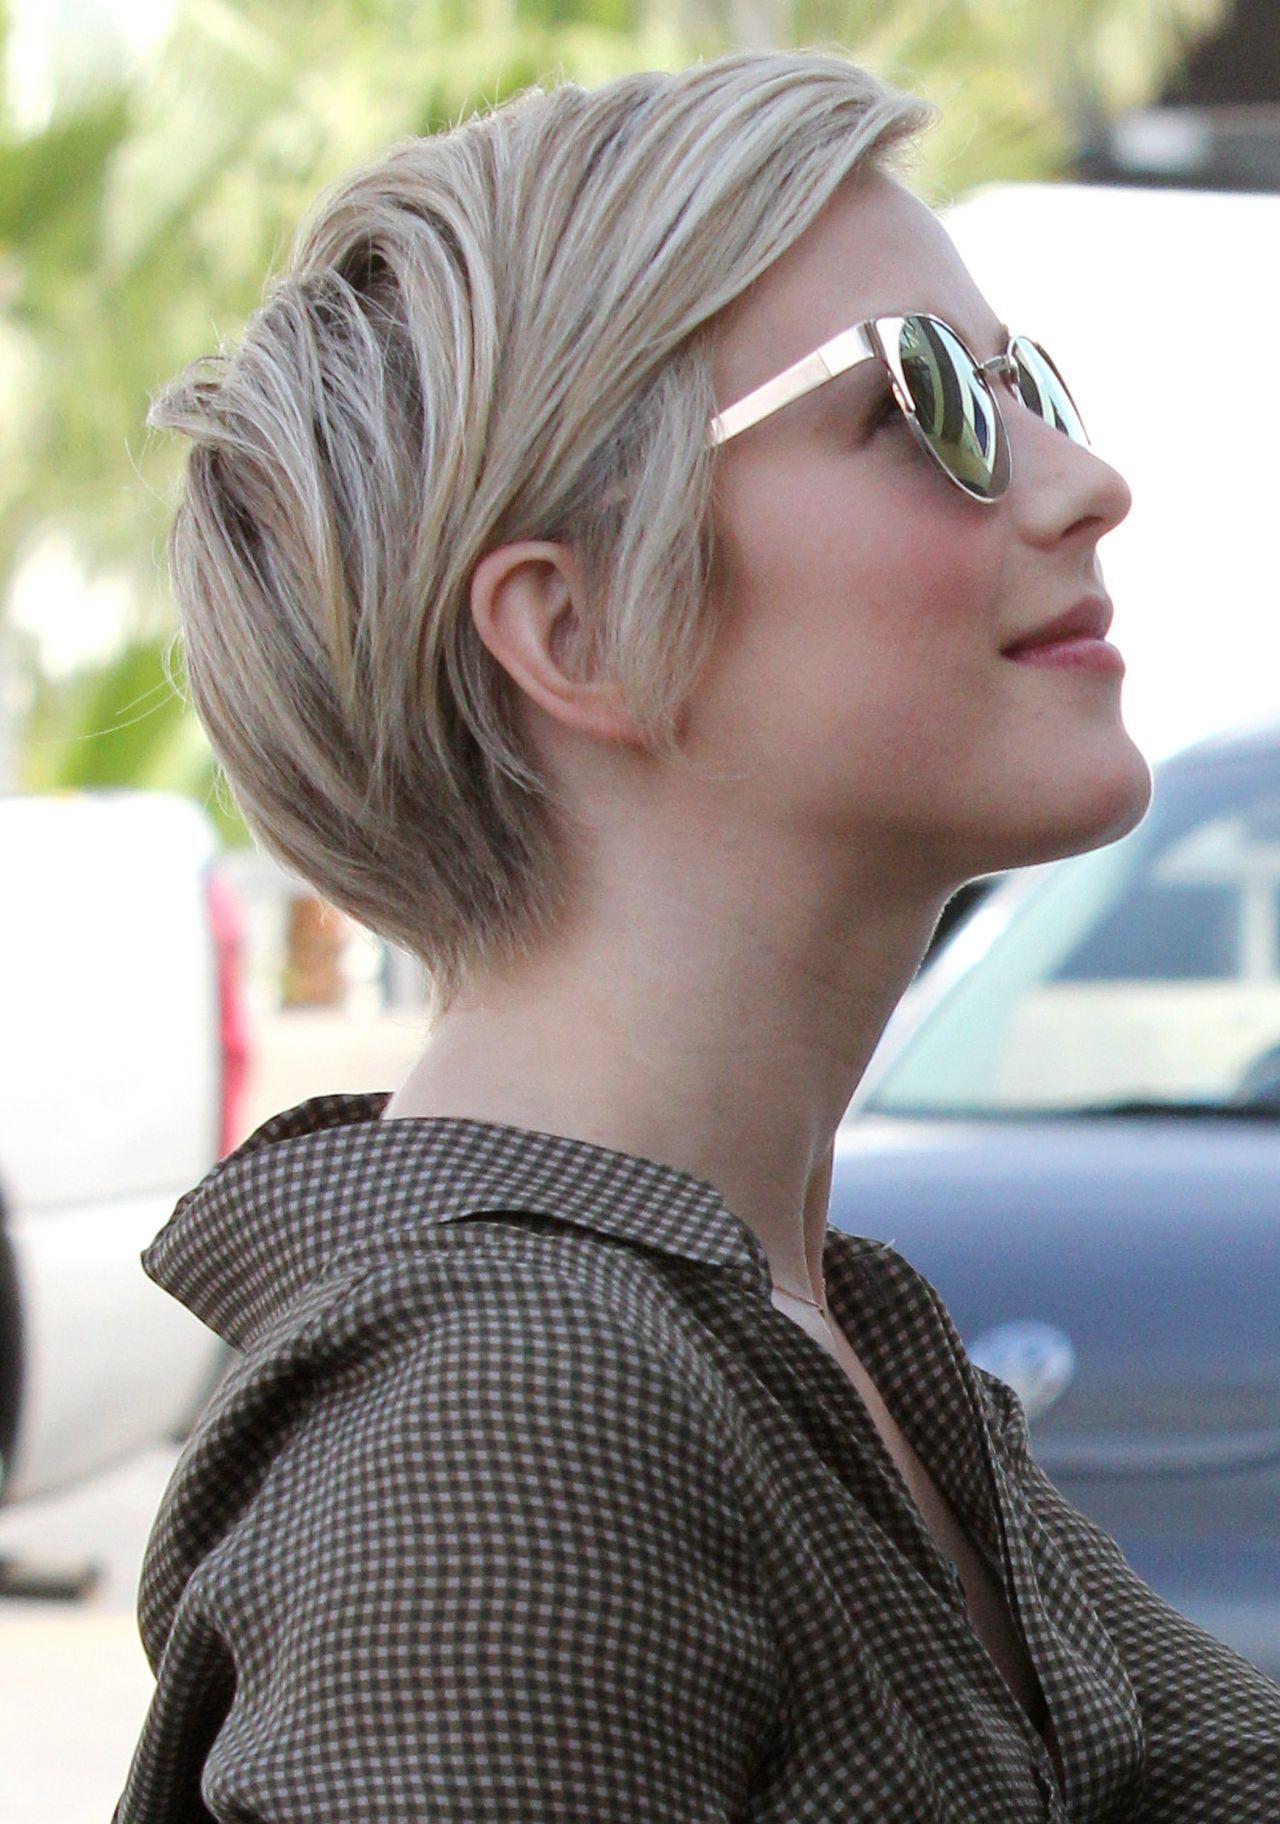 Julianne Hough Short Hair 2014 | Hair Envy! | Pinterest | Hair for Julianne Hough Short Hairstyles